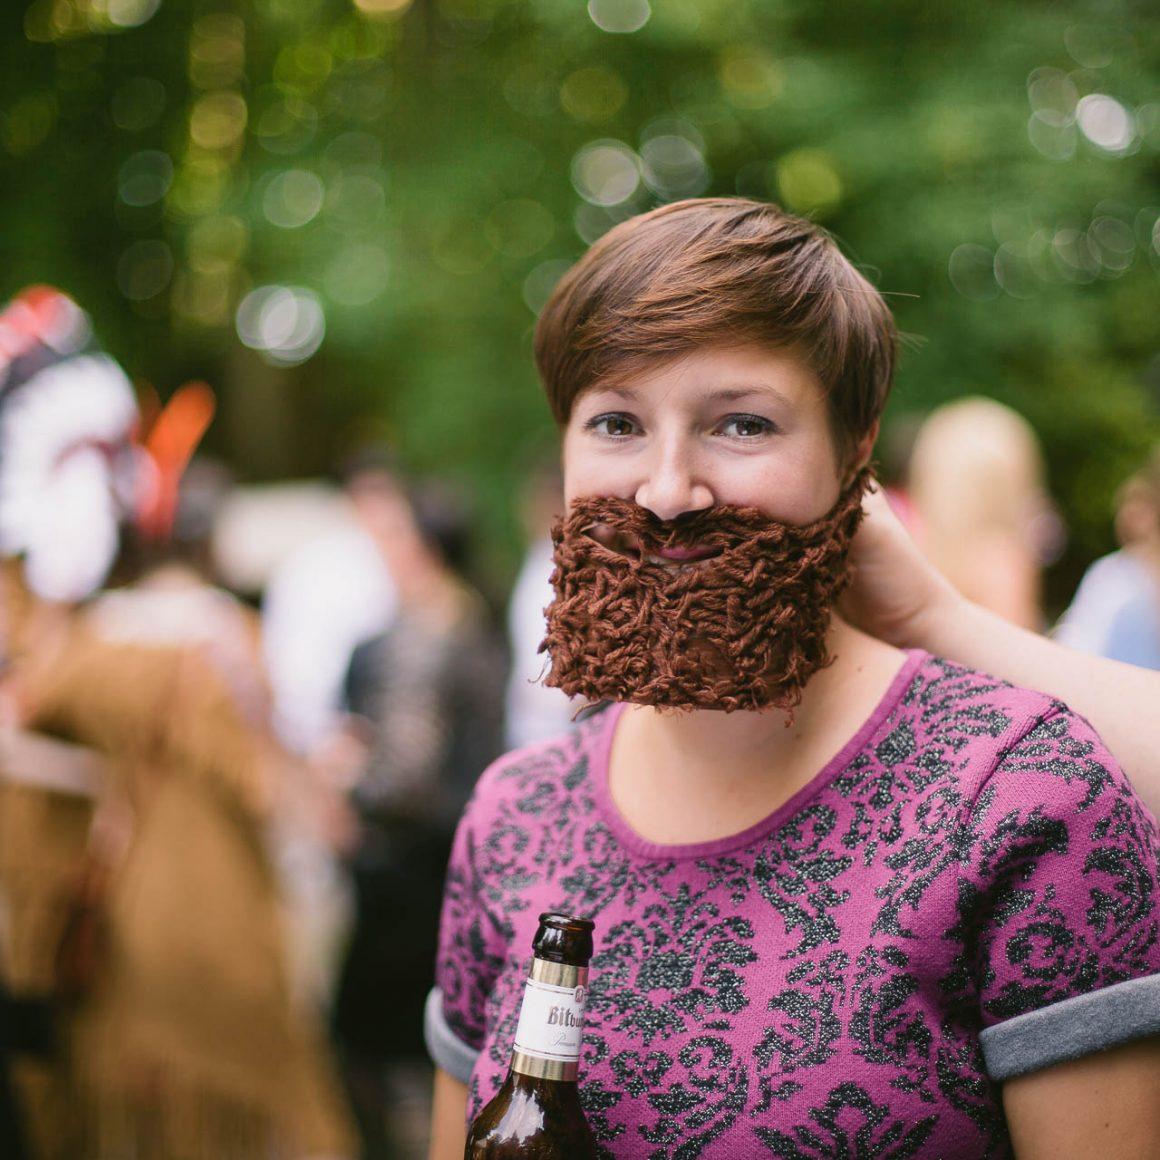 The Beard's Tale